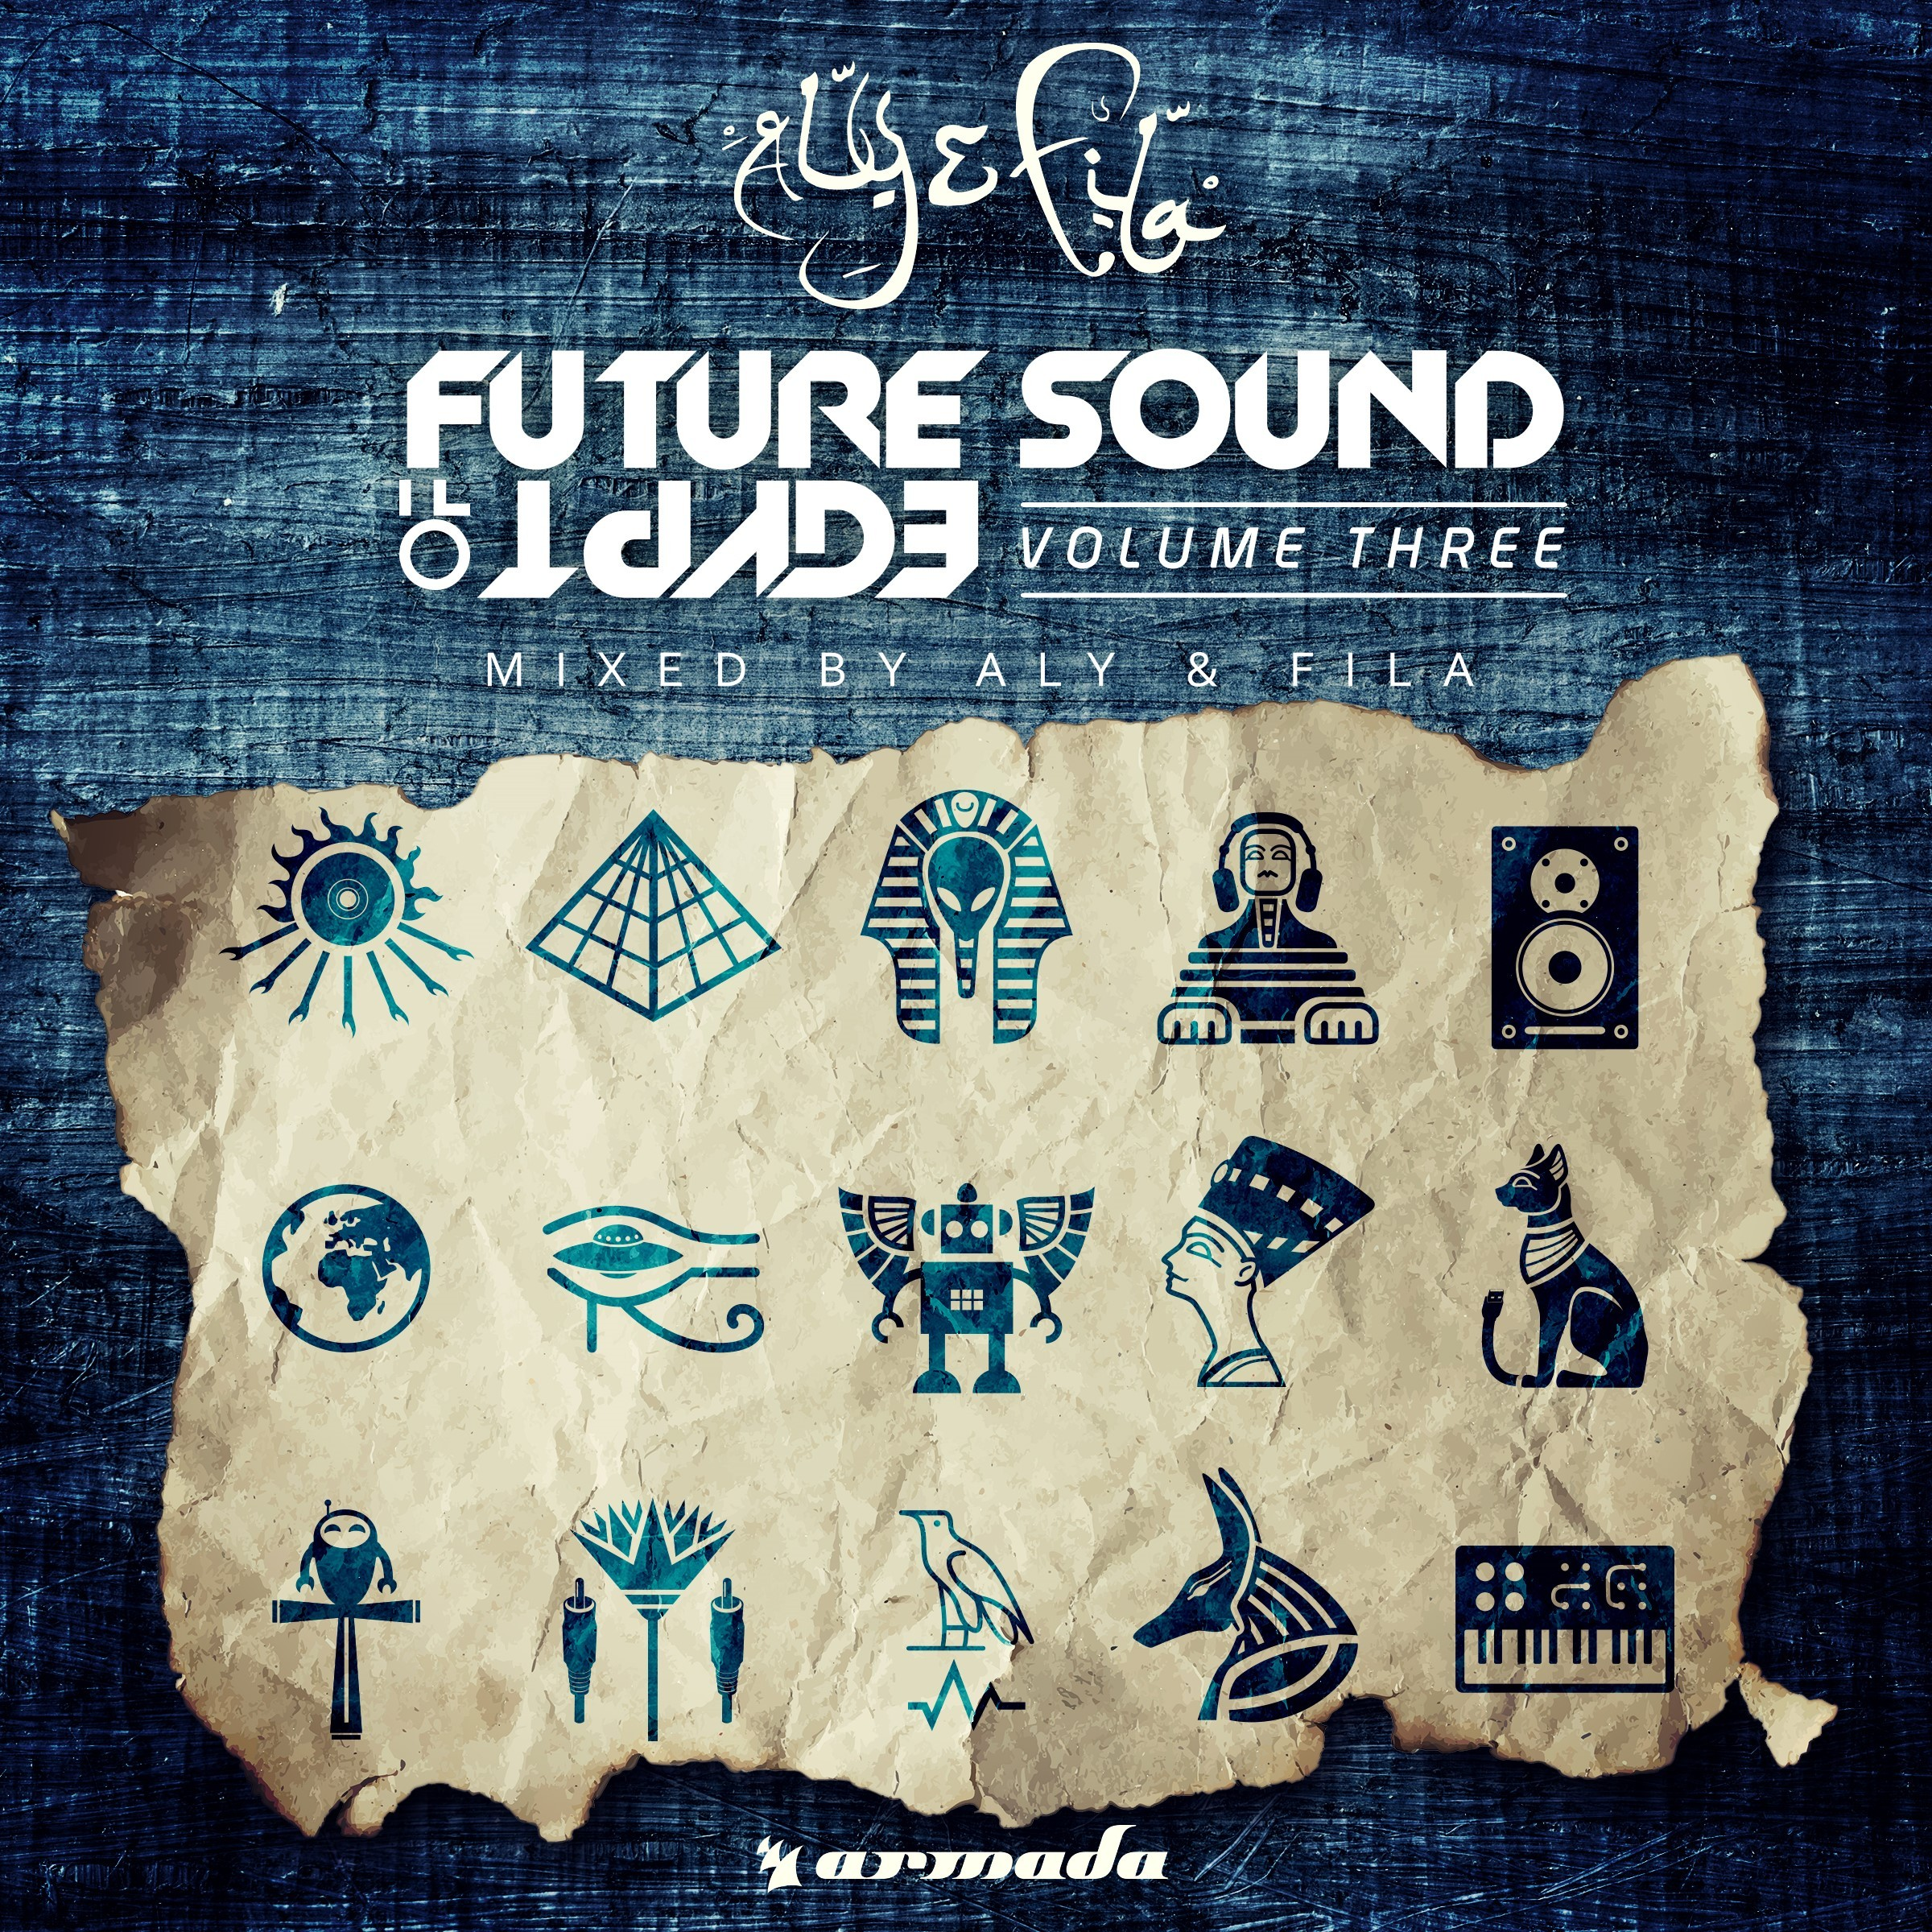 Aly & Fila - Future Sound of Egypt 3